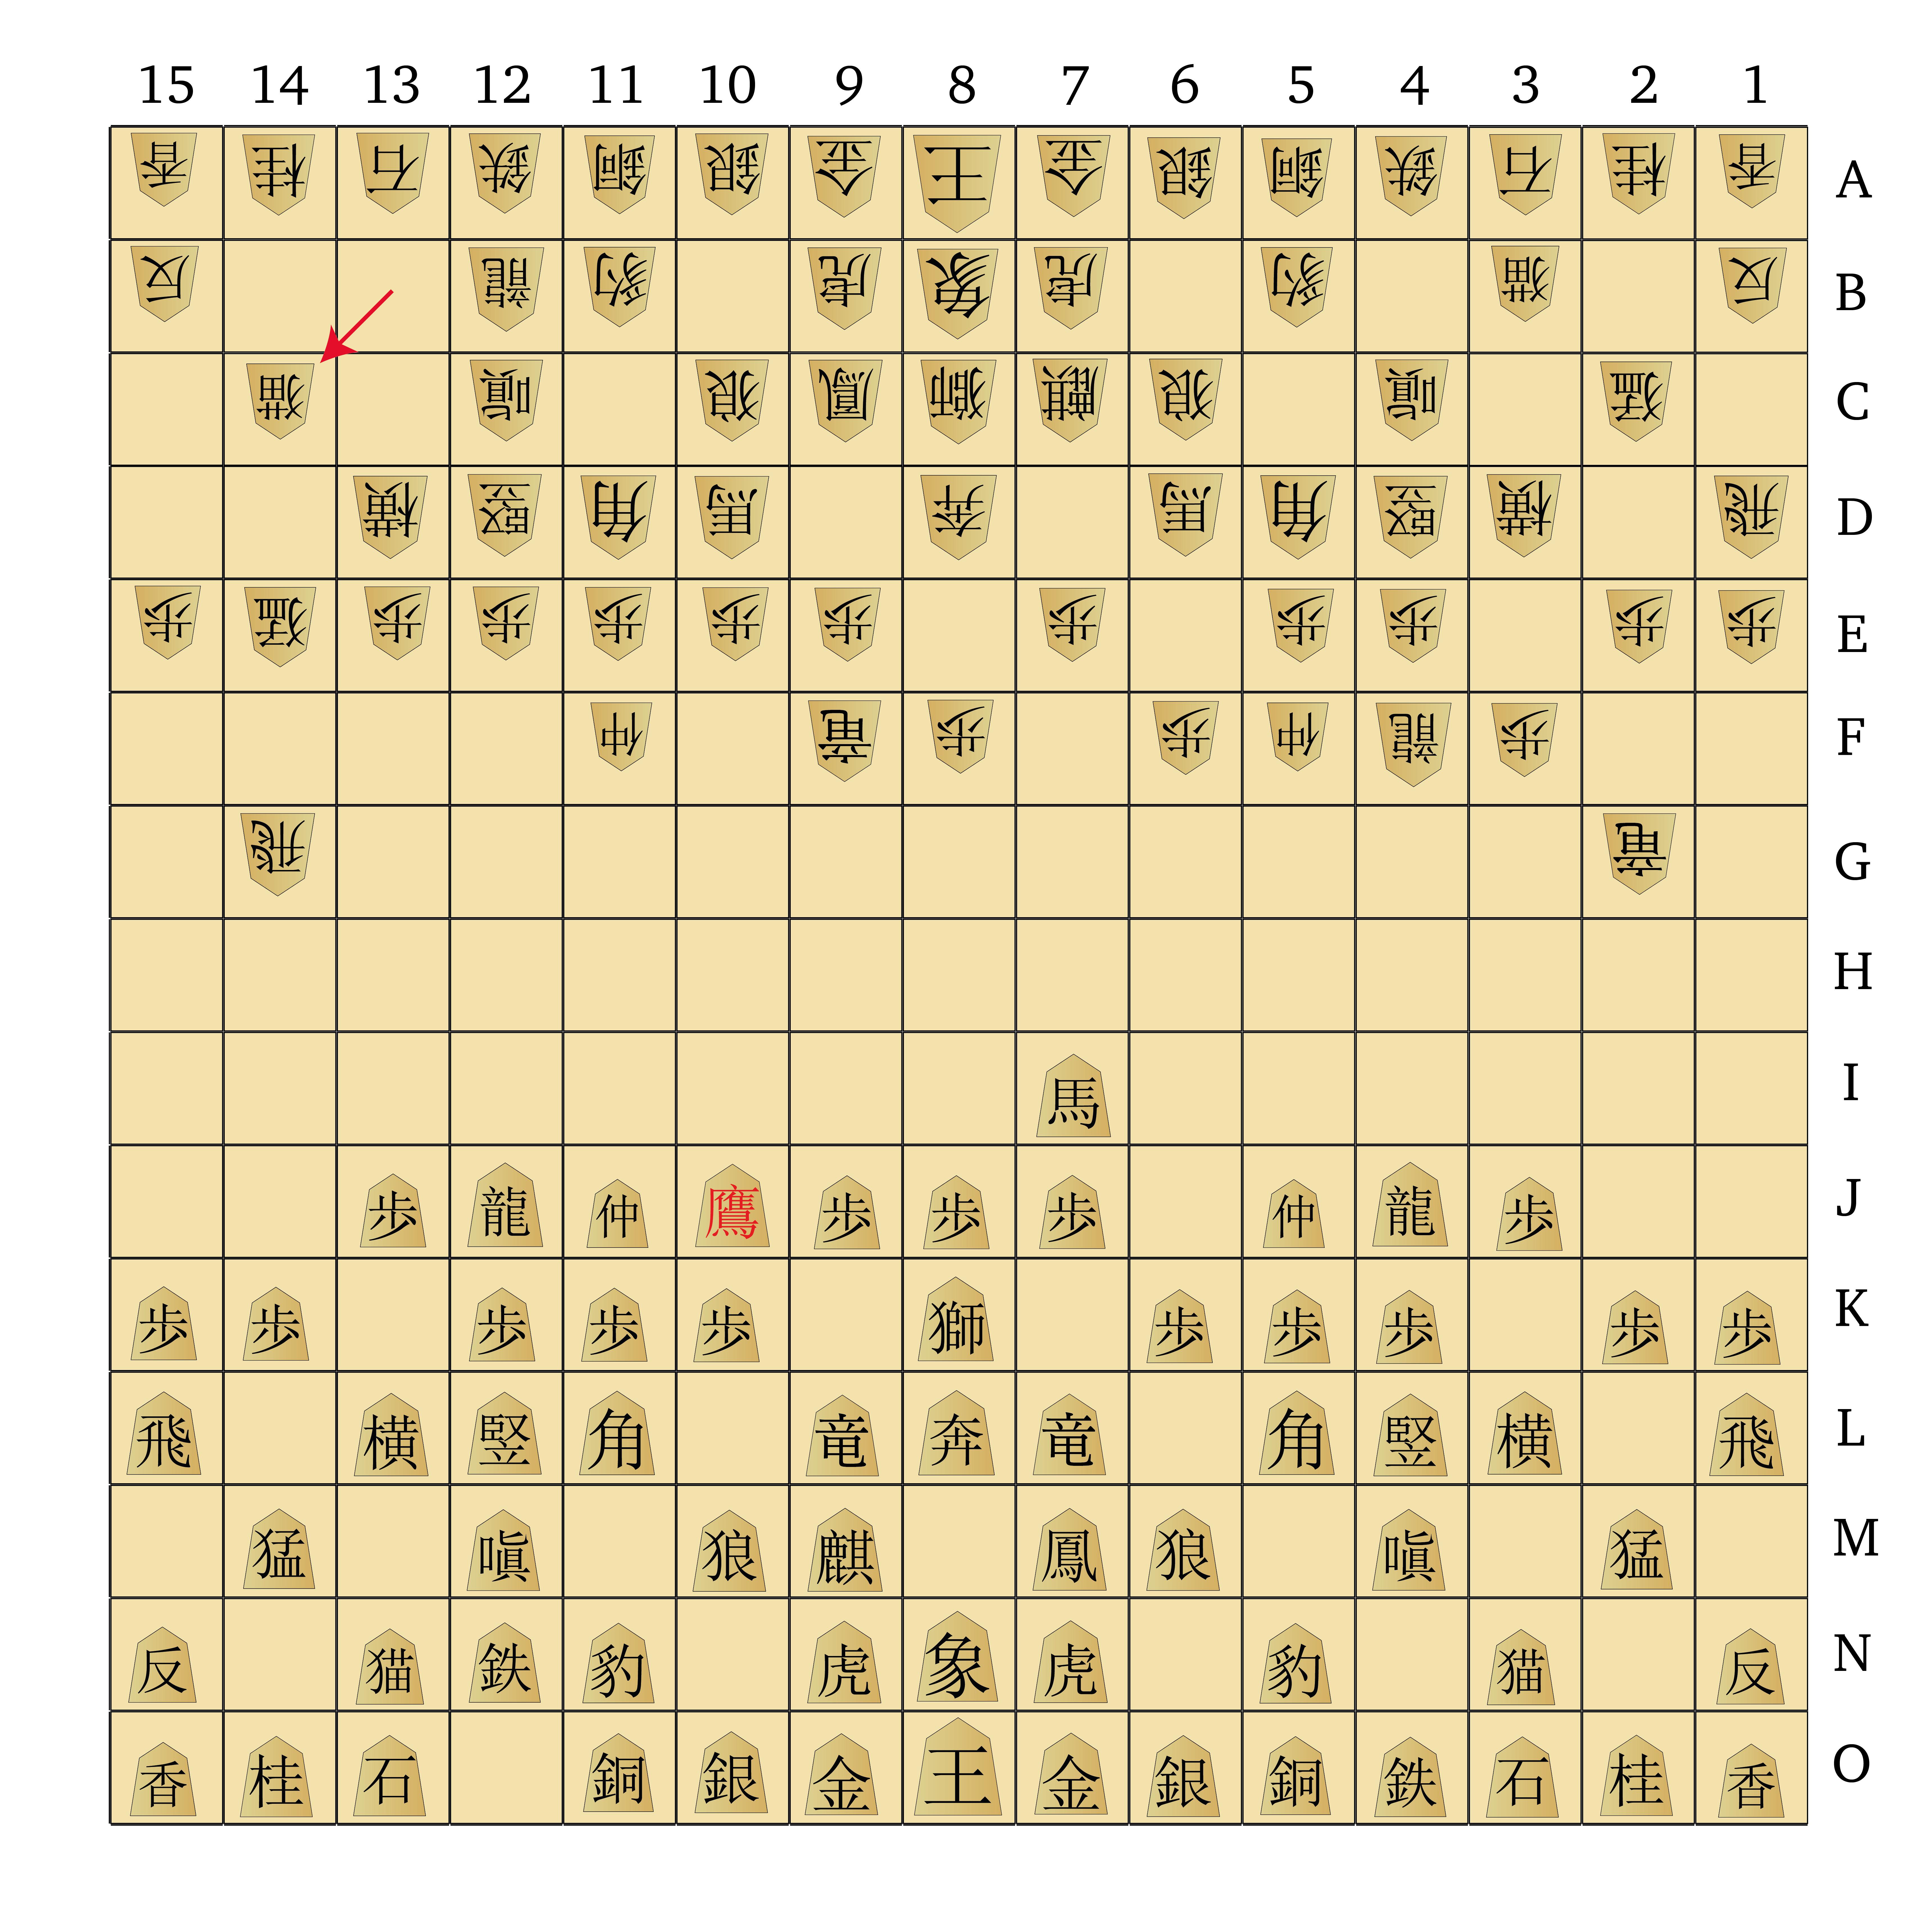 Dai Shogi 420 -- Move 30-01